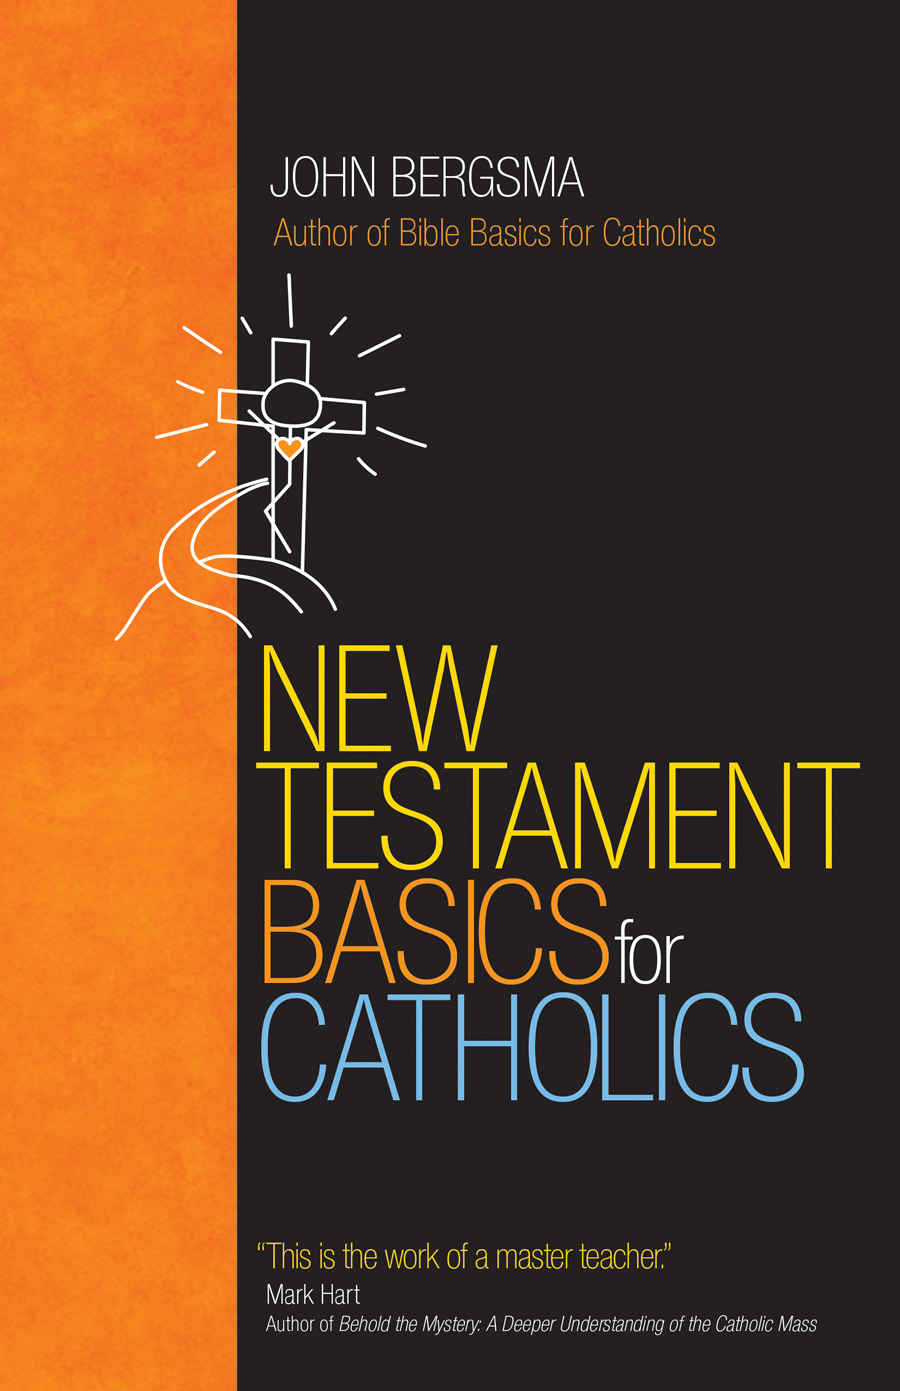 New testament basics for catholics ave maria press new testament basics for catholics fandeluxe Images